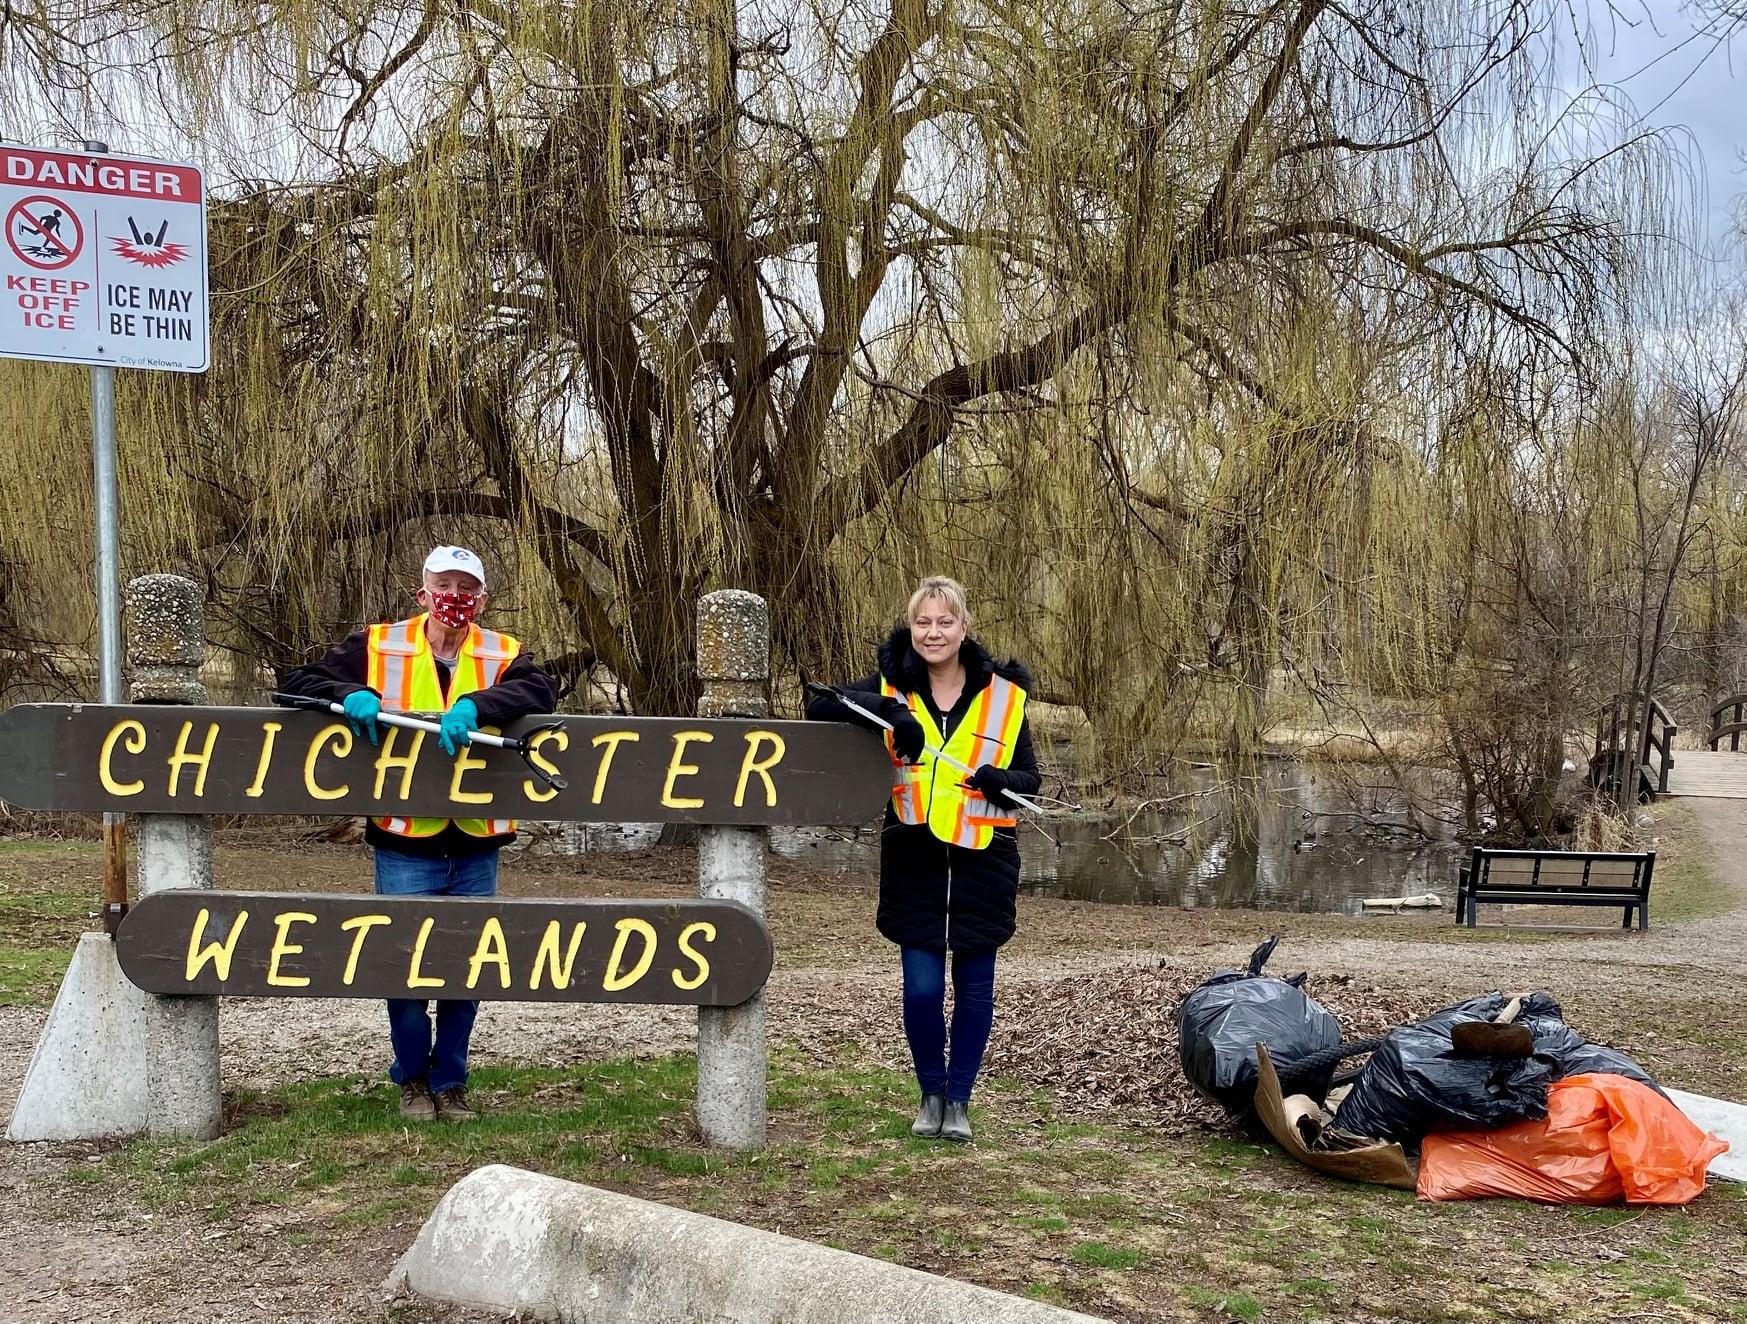 Rutland community spring clean up